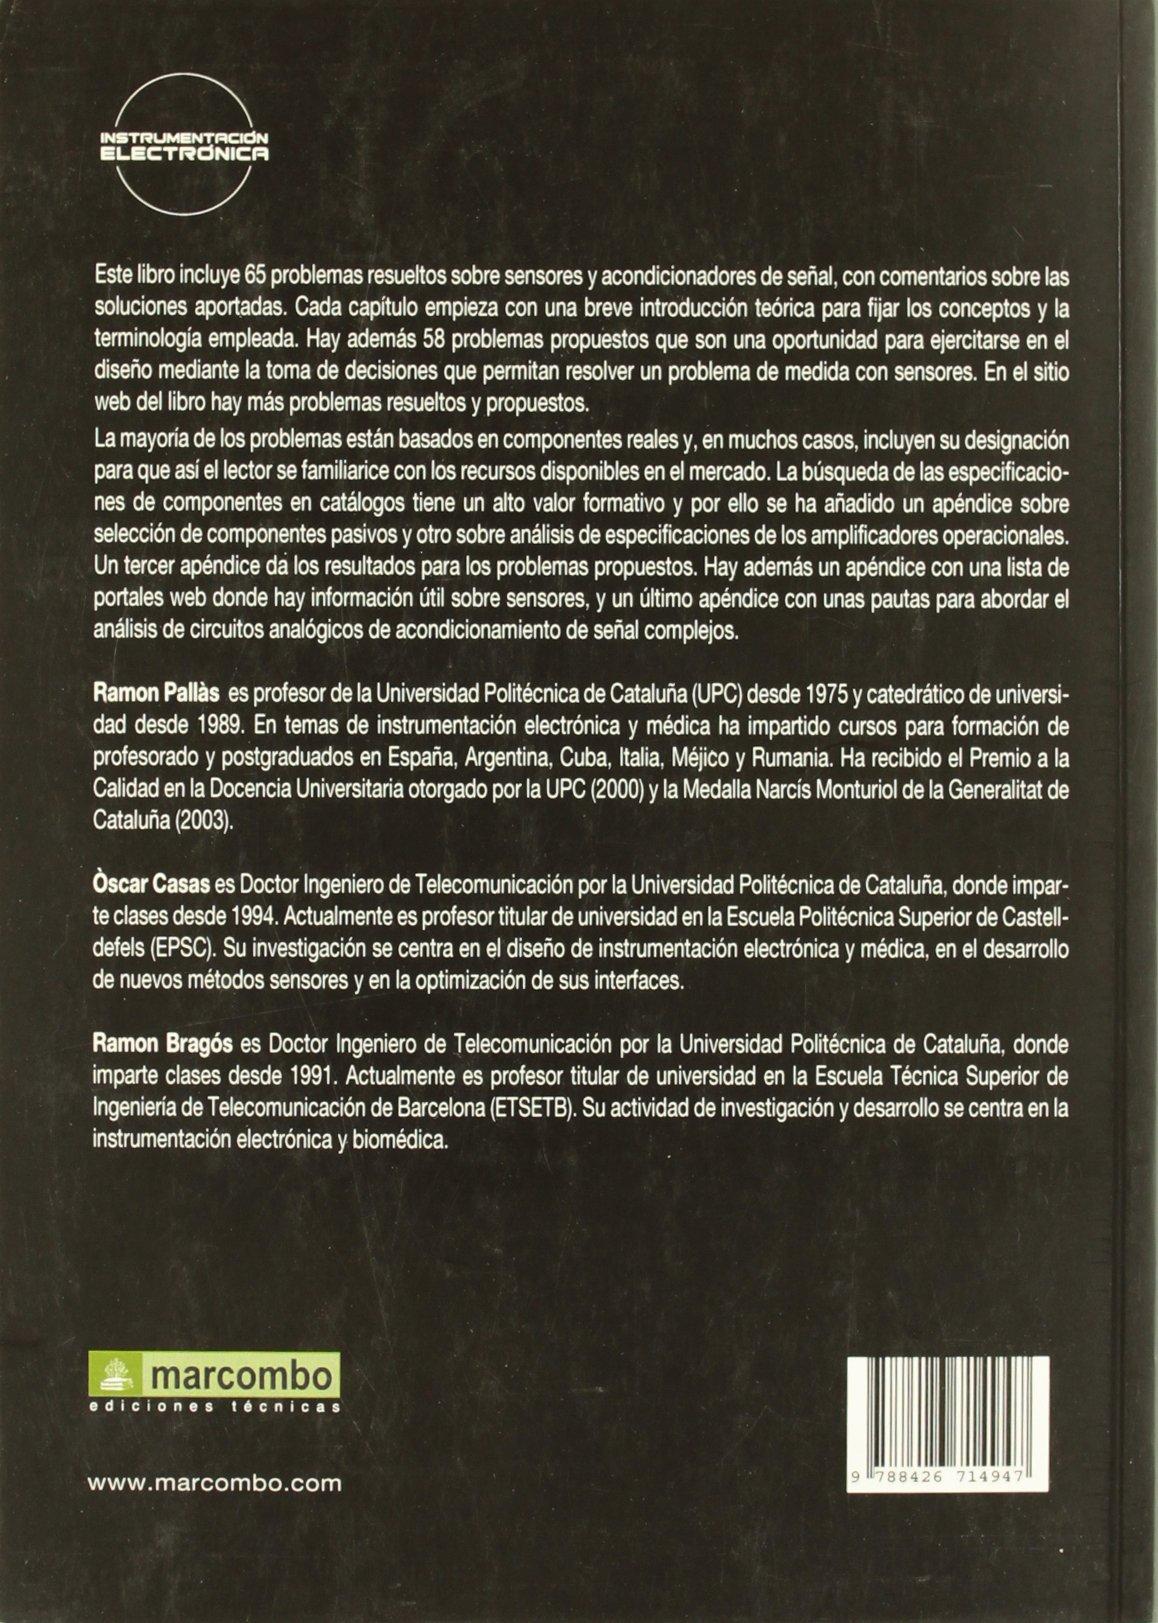 Sensores y Acondicionadores de Señal, Problemas Resueltos: Amazon.es: Ramon Pallàs Areny, Oscar Casas Piedrafita, Ramon Bargós Bardía: Libros